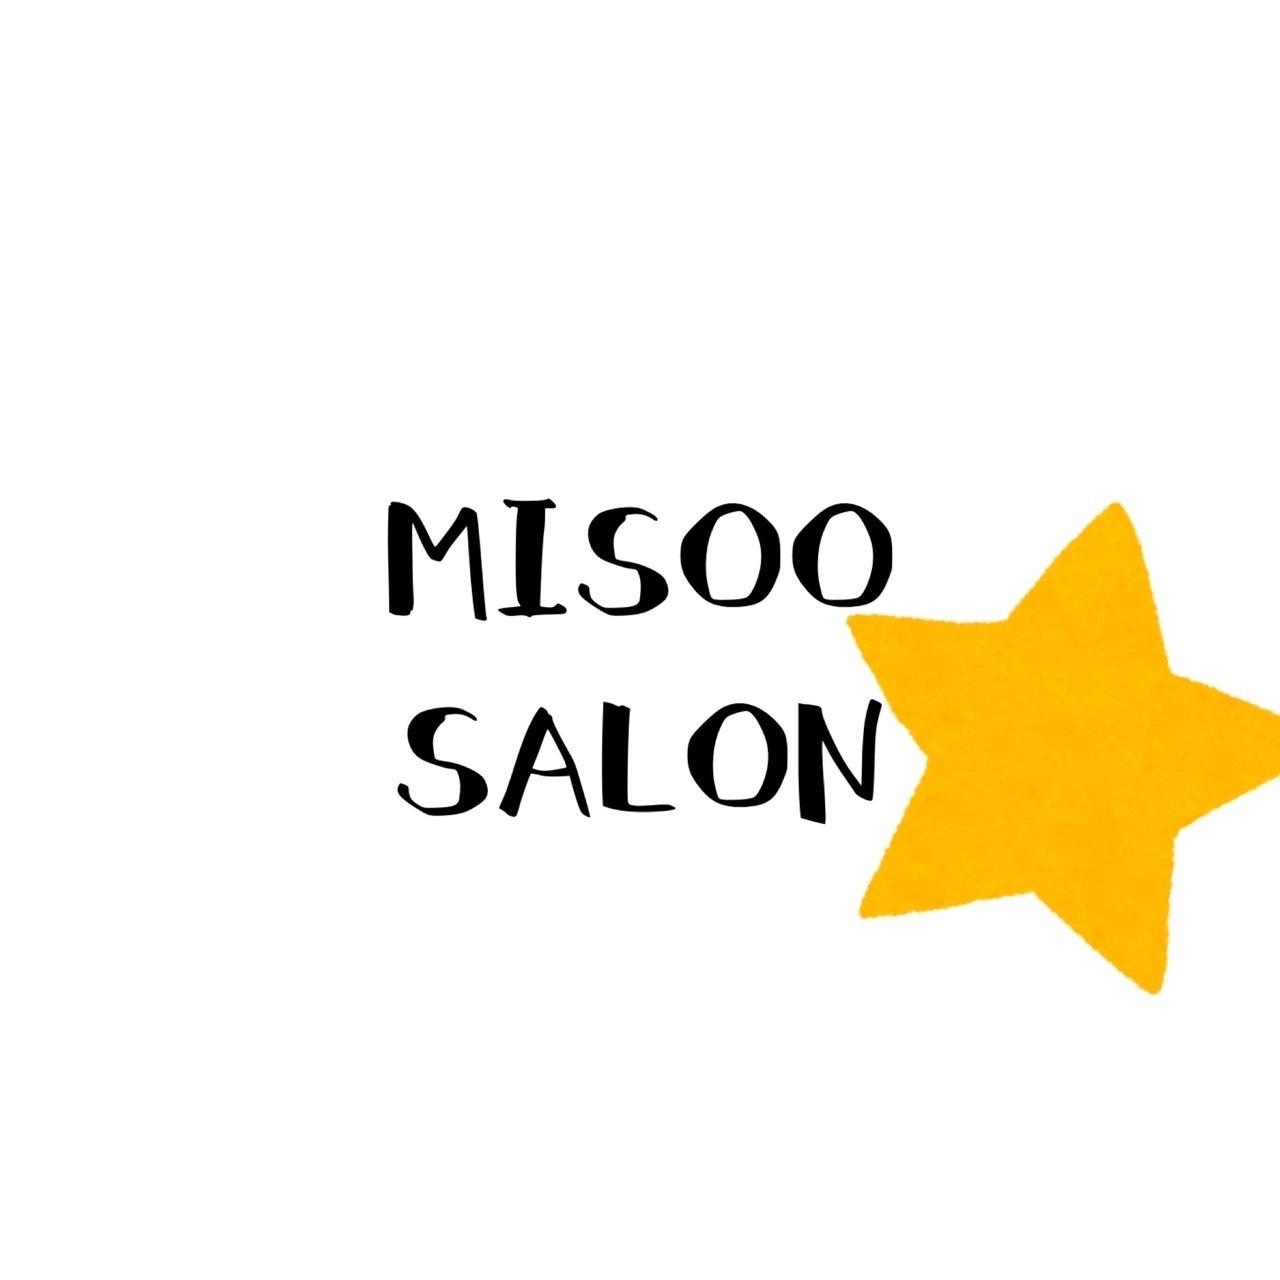 MISOOSALON's icon